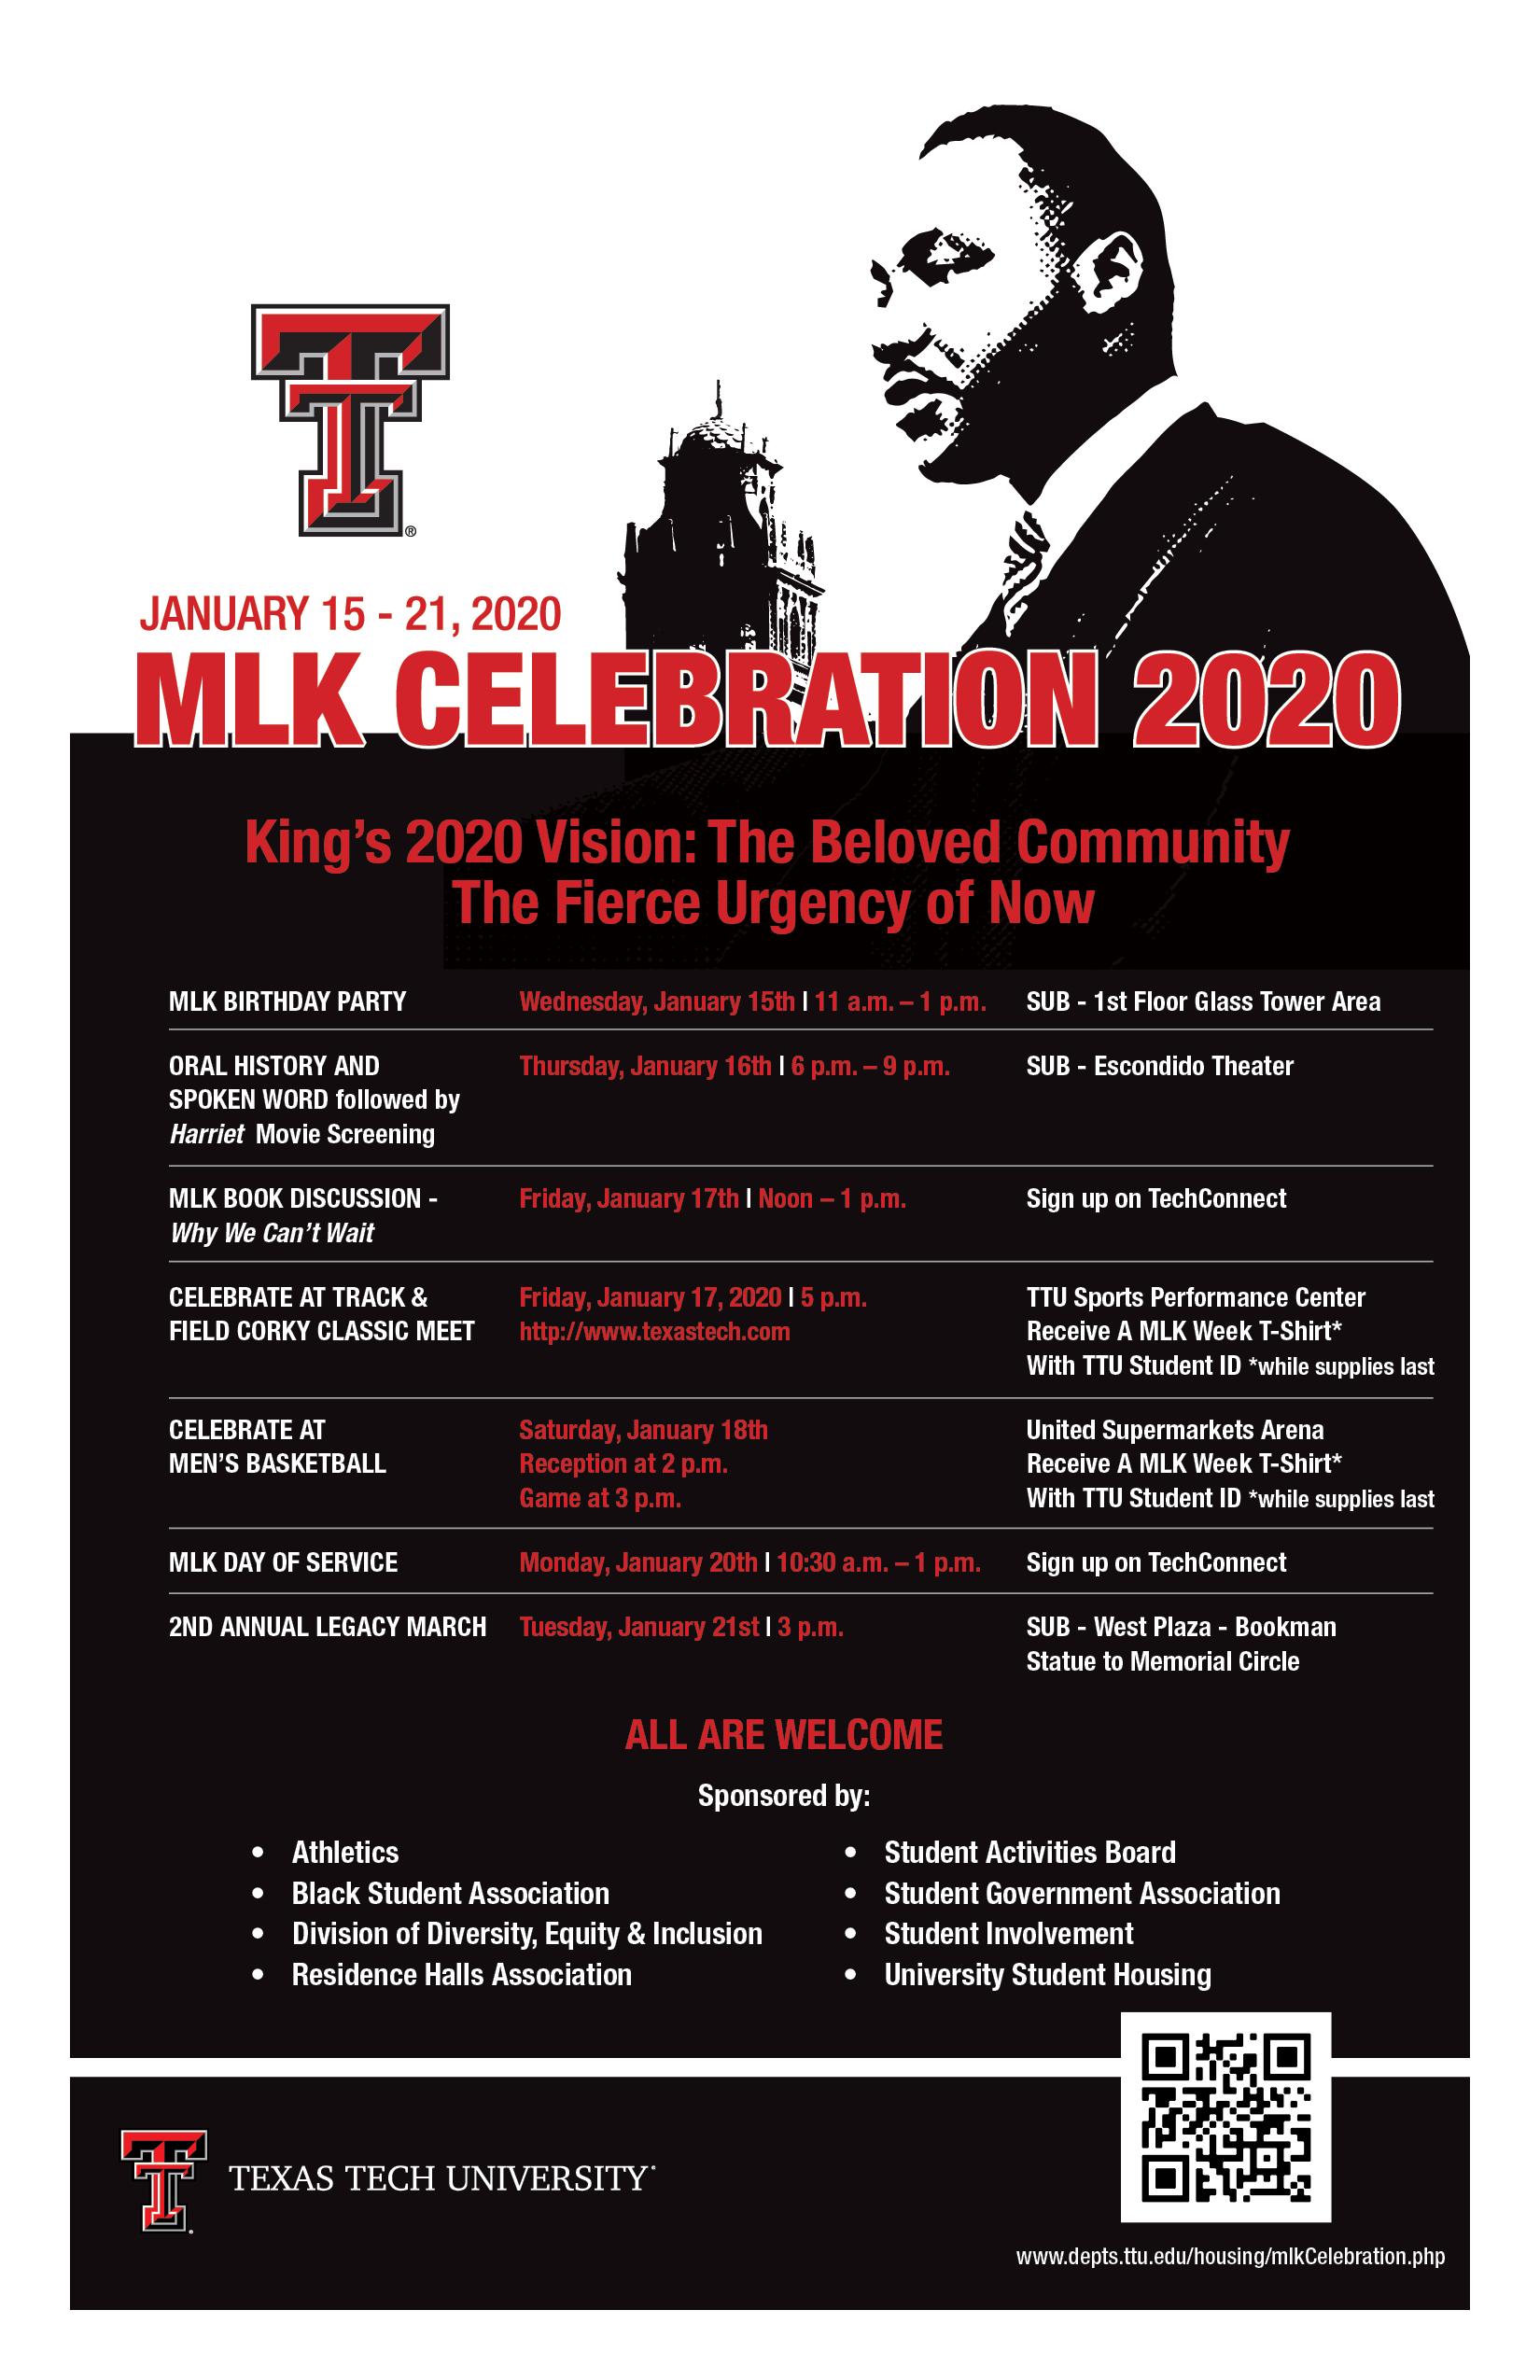 Mlk Celebration 2020 | Housing | Ttu Intended For Texas Tech University Holiday Schedule 2021